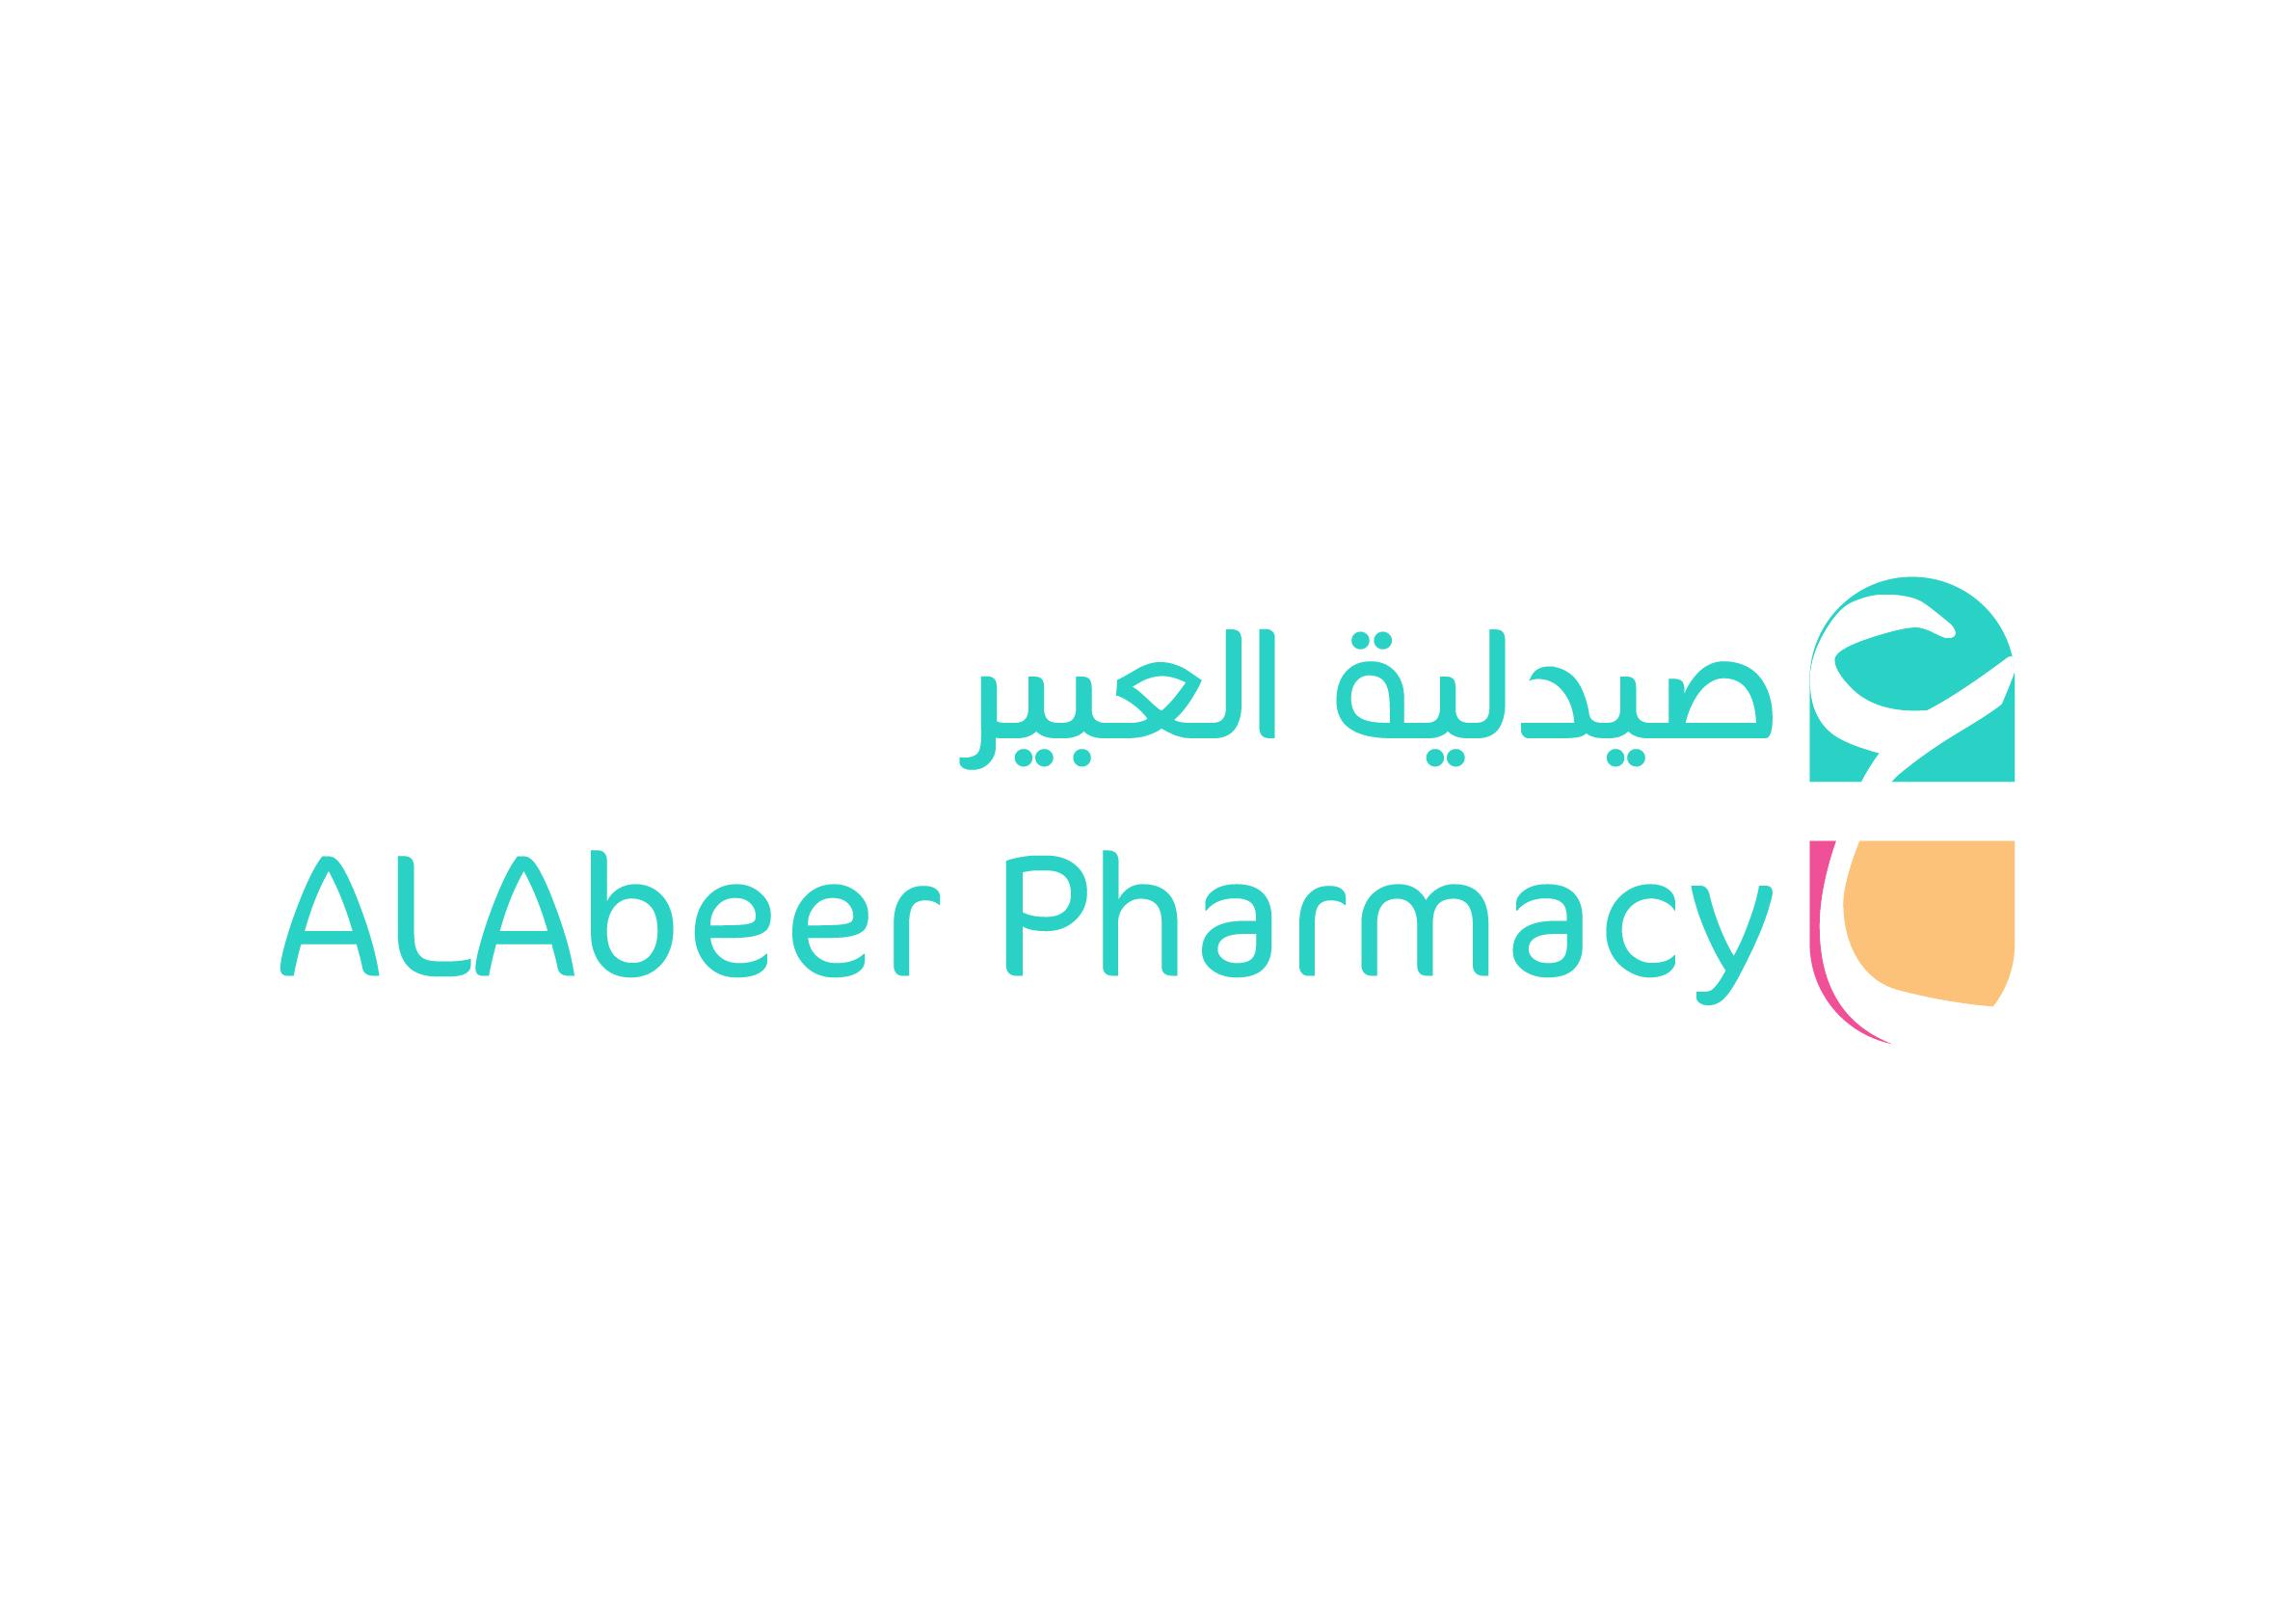 alabeer pharmacy logo design